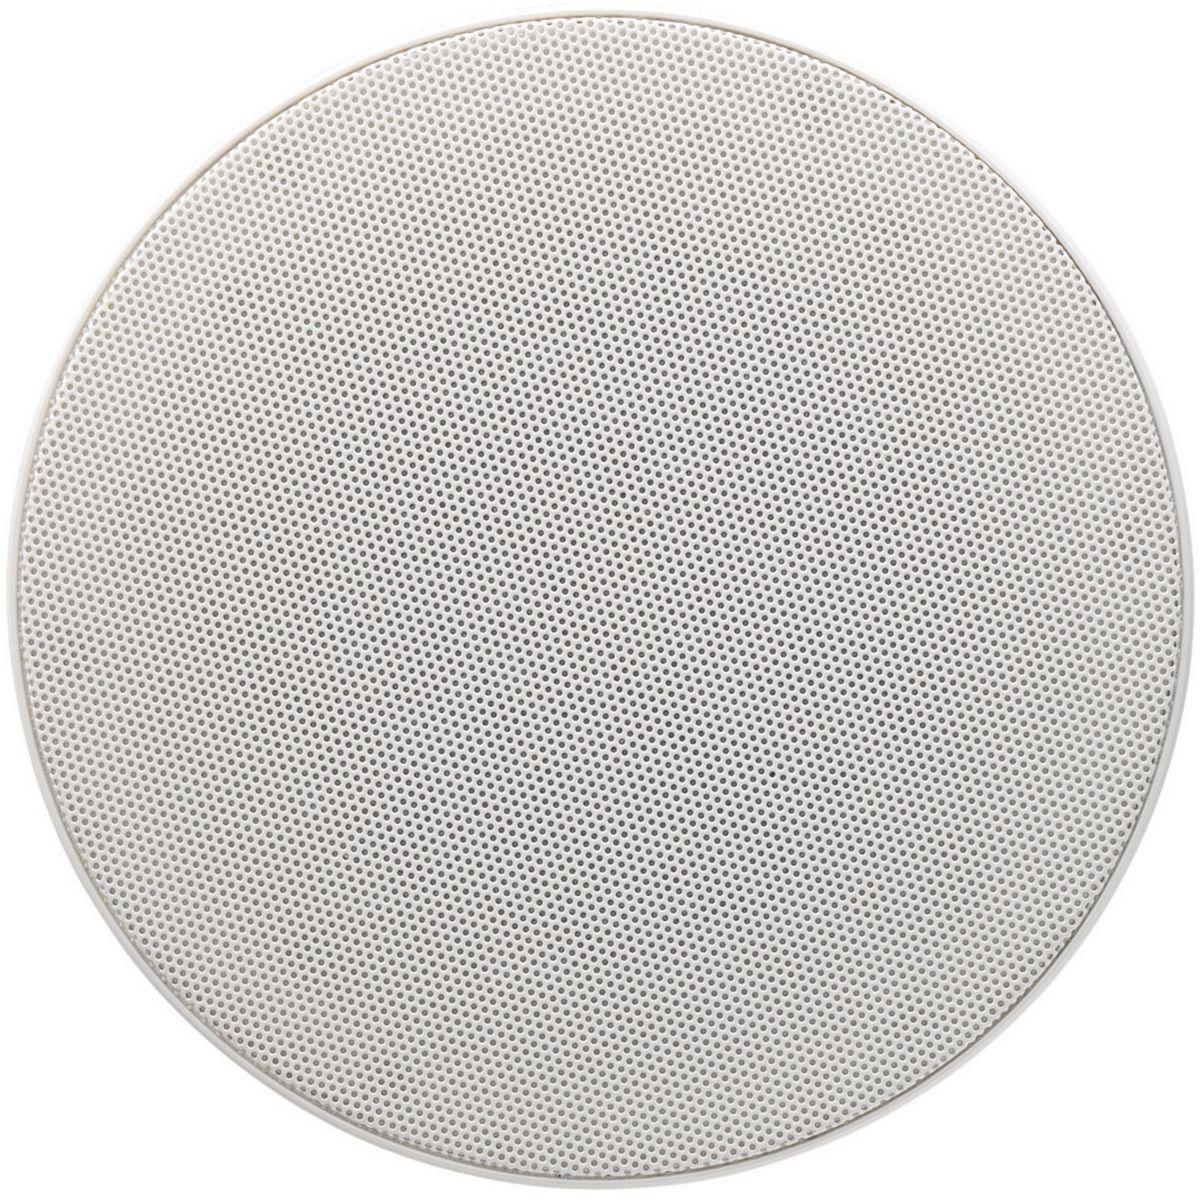 Enceinte encastrable yamaha ns-ic600 blanc - livraison offerte : code livprem (photo)